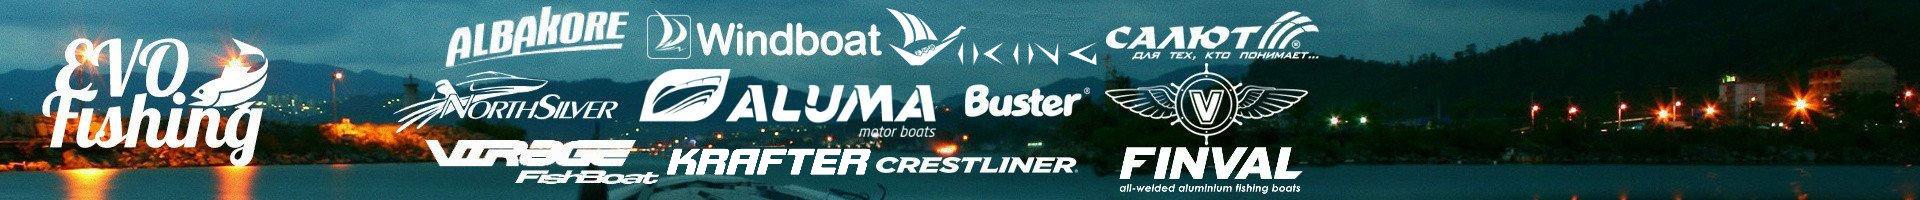 EVOfishing Форум о Лодках и Рыбалке